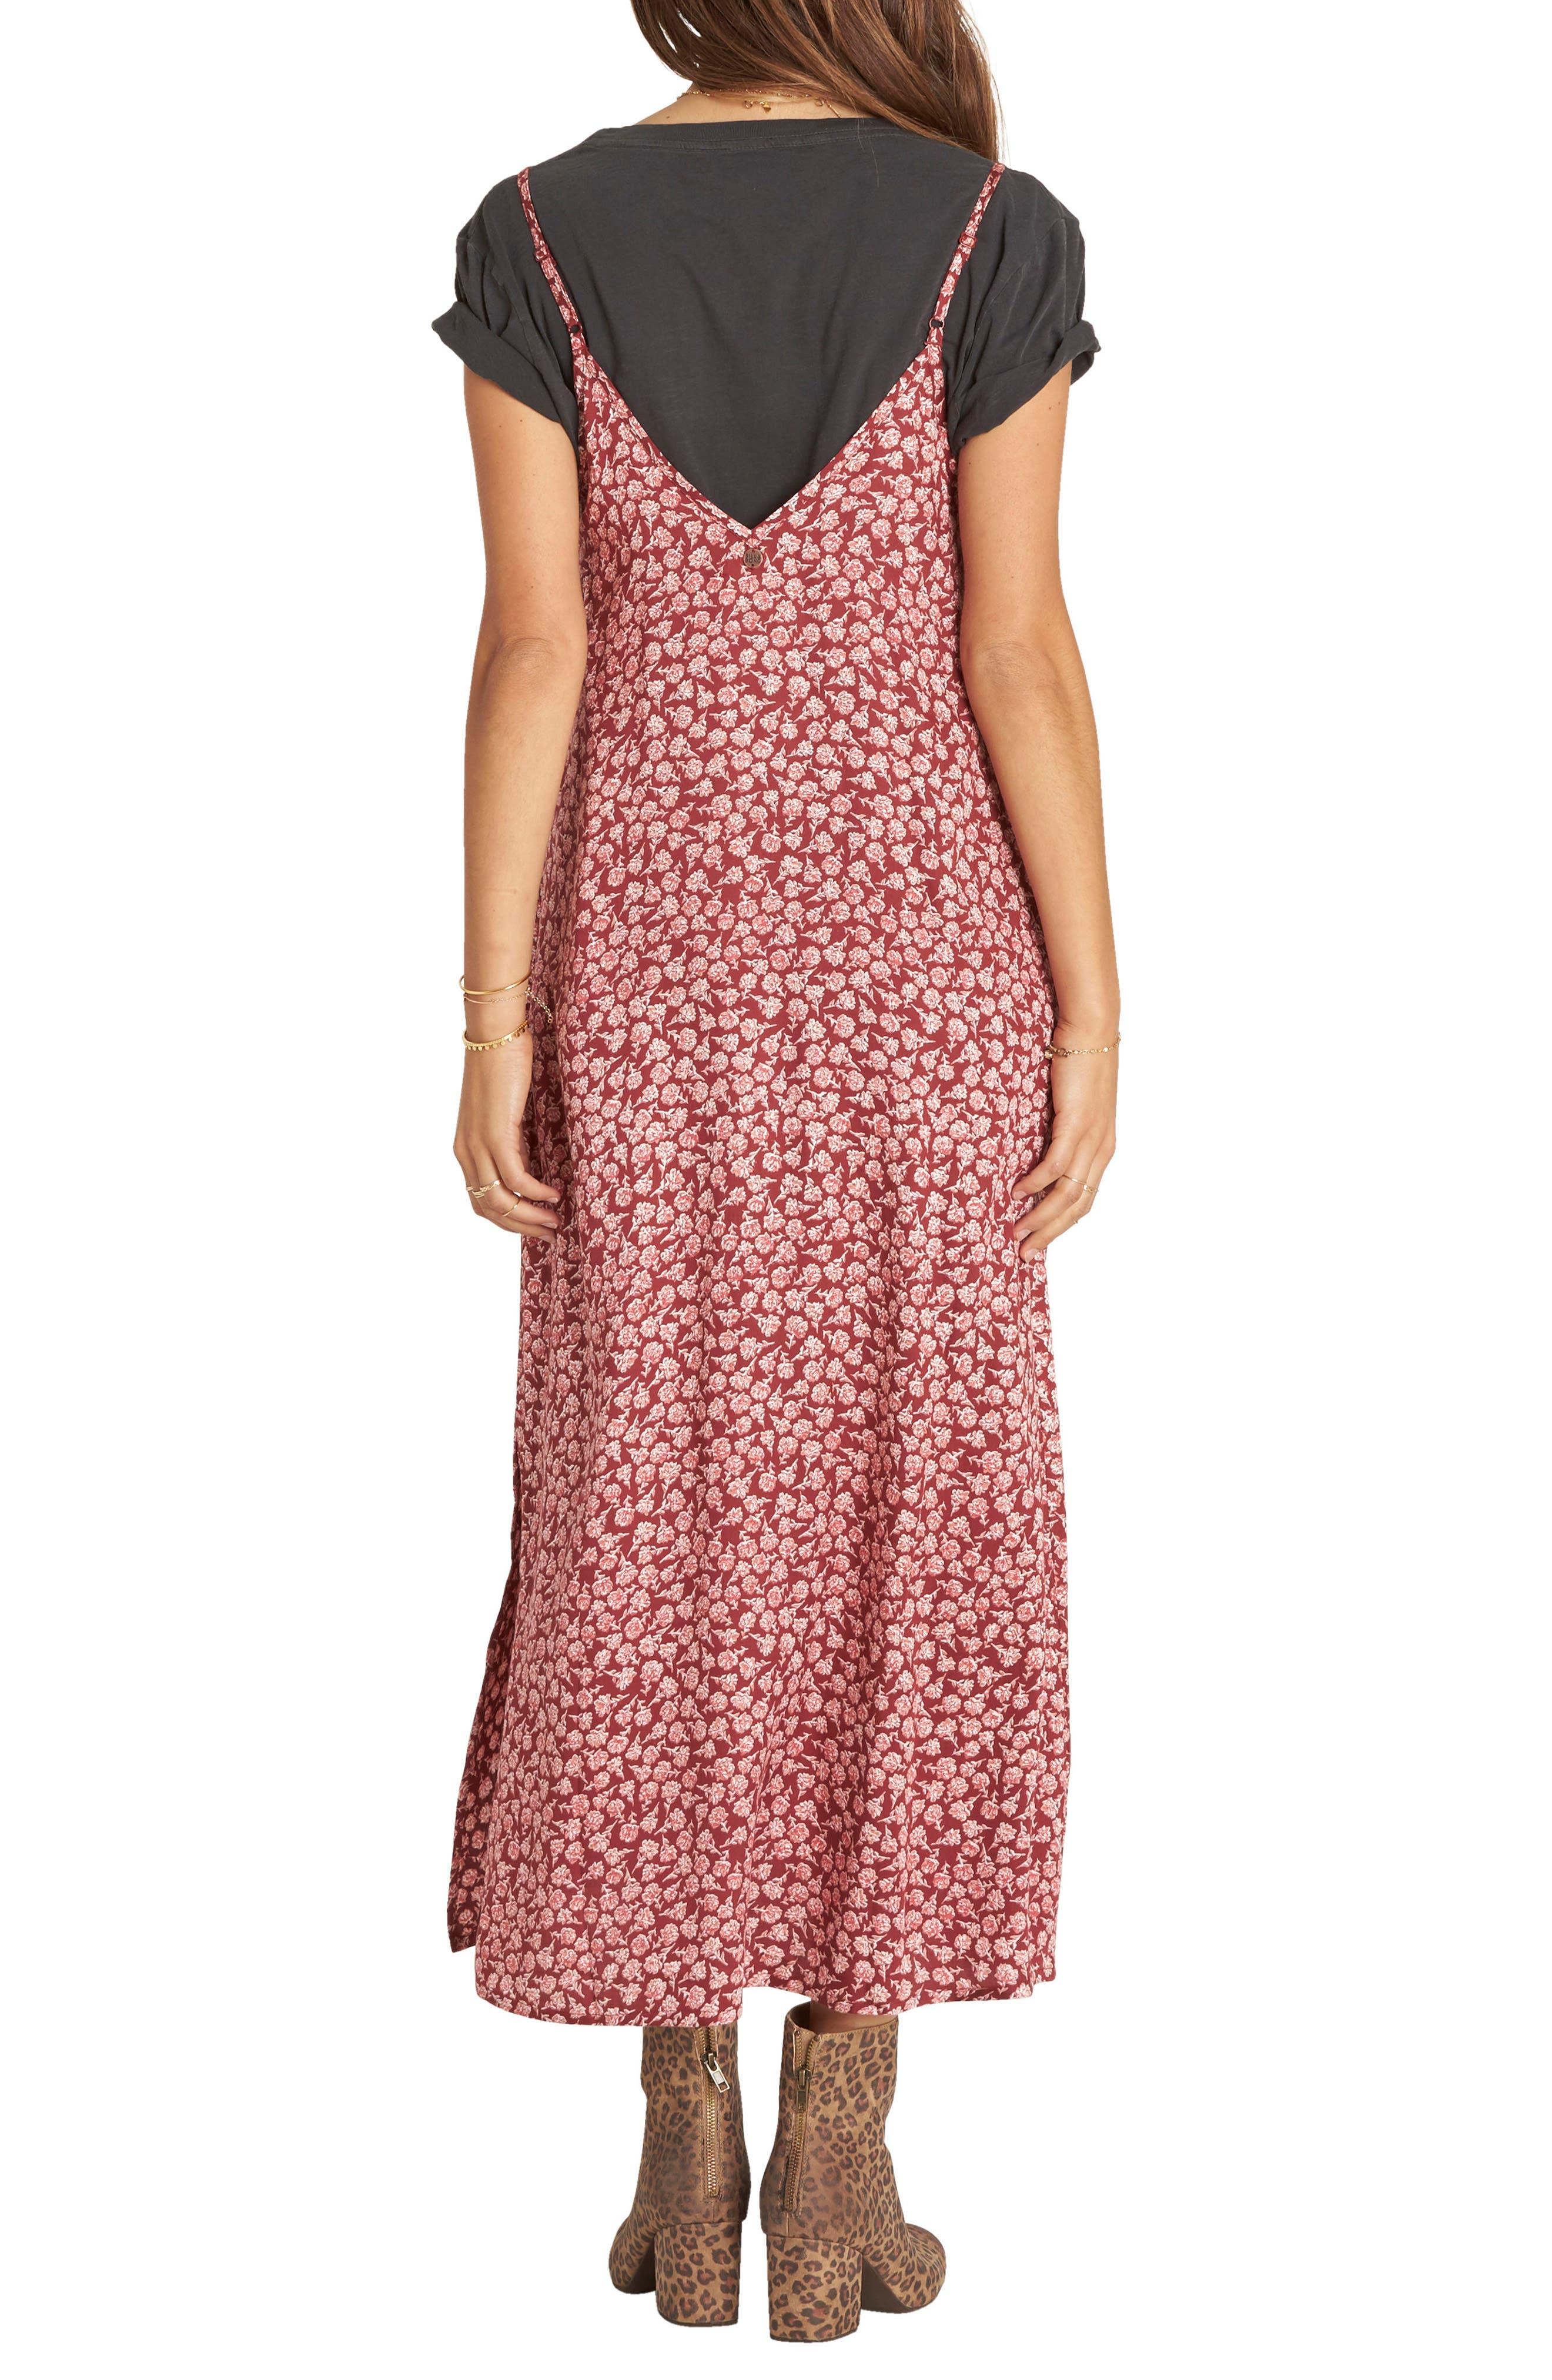 Dreamy Garden Print Dress,                             Alternate thumbnail 2, color,                             002